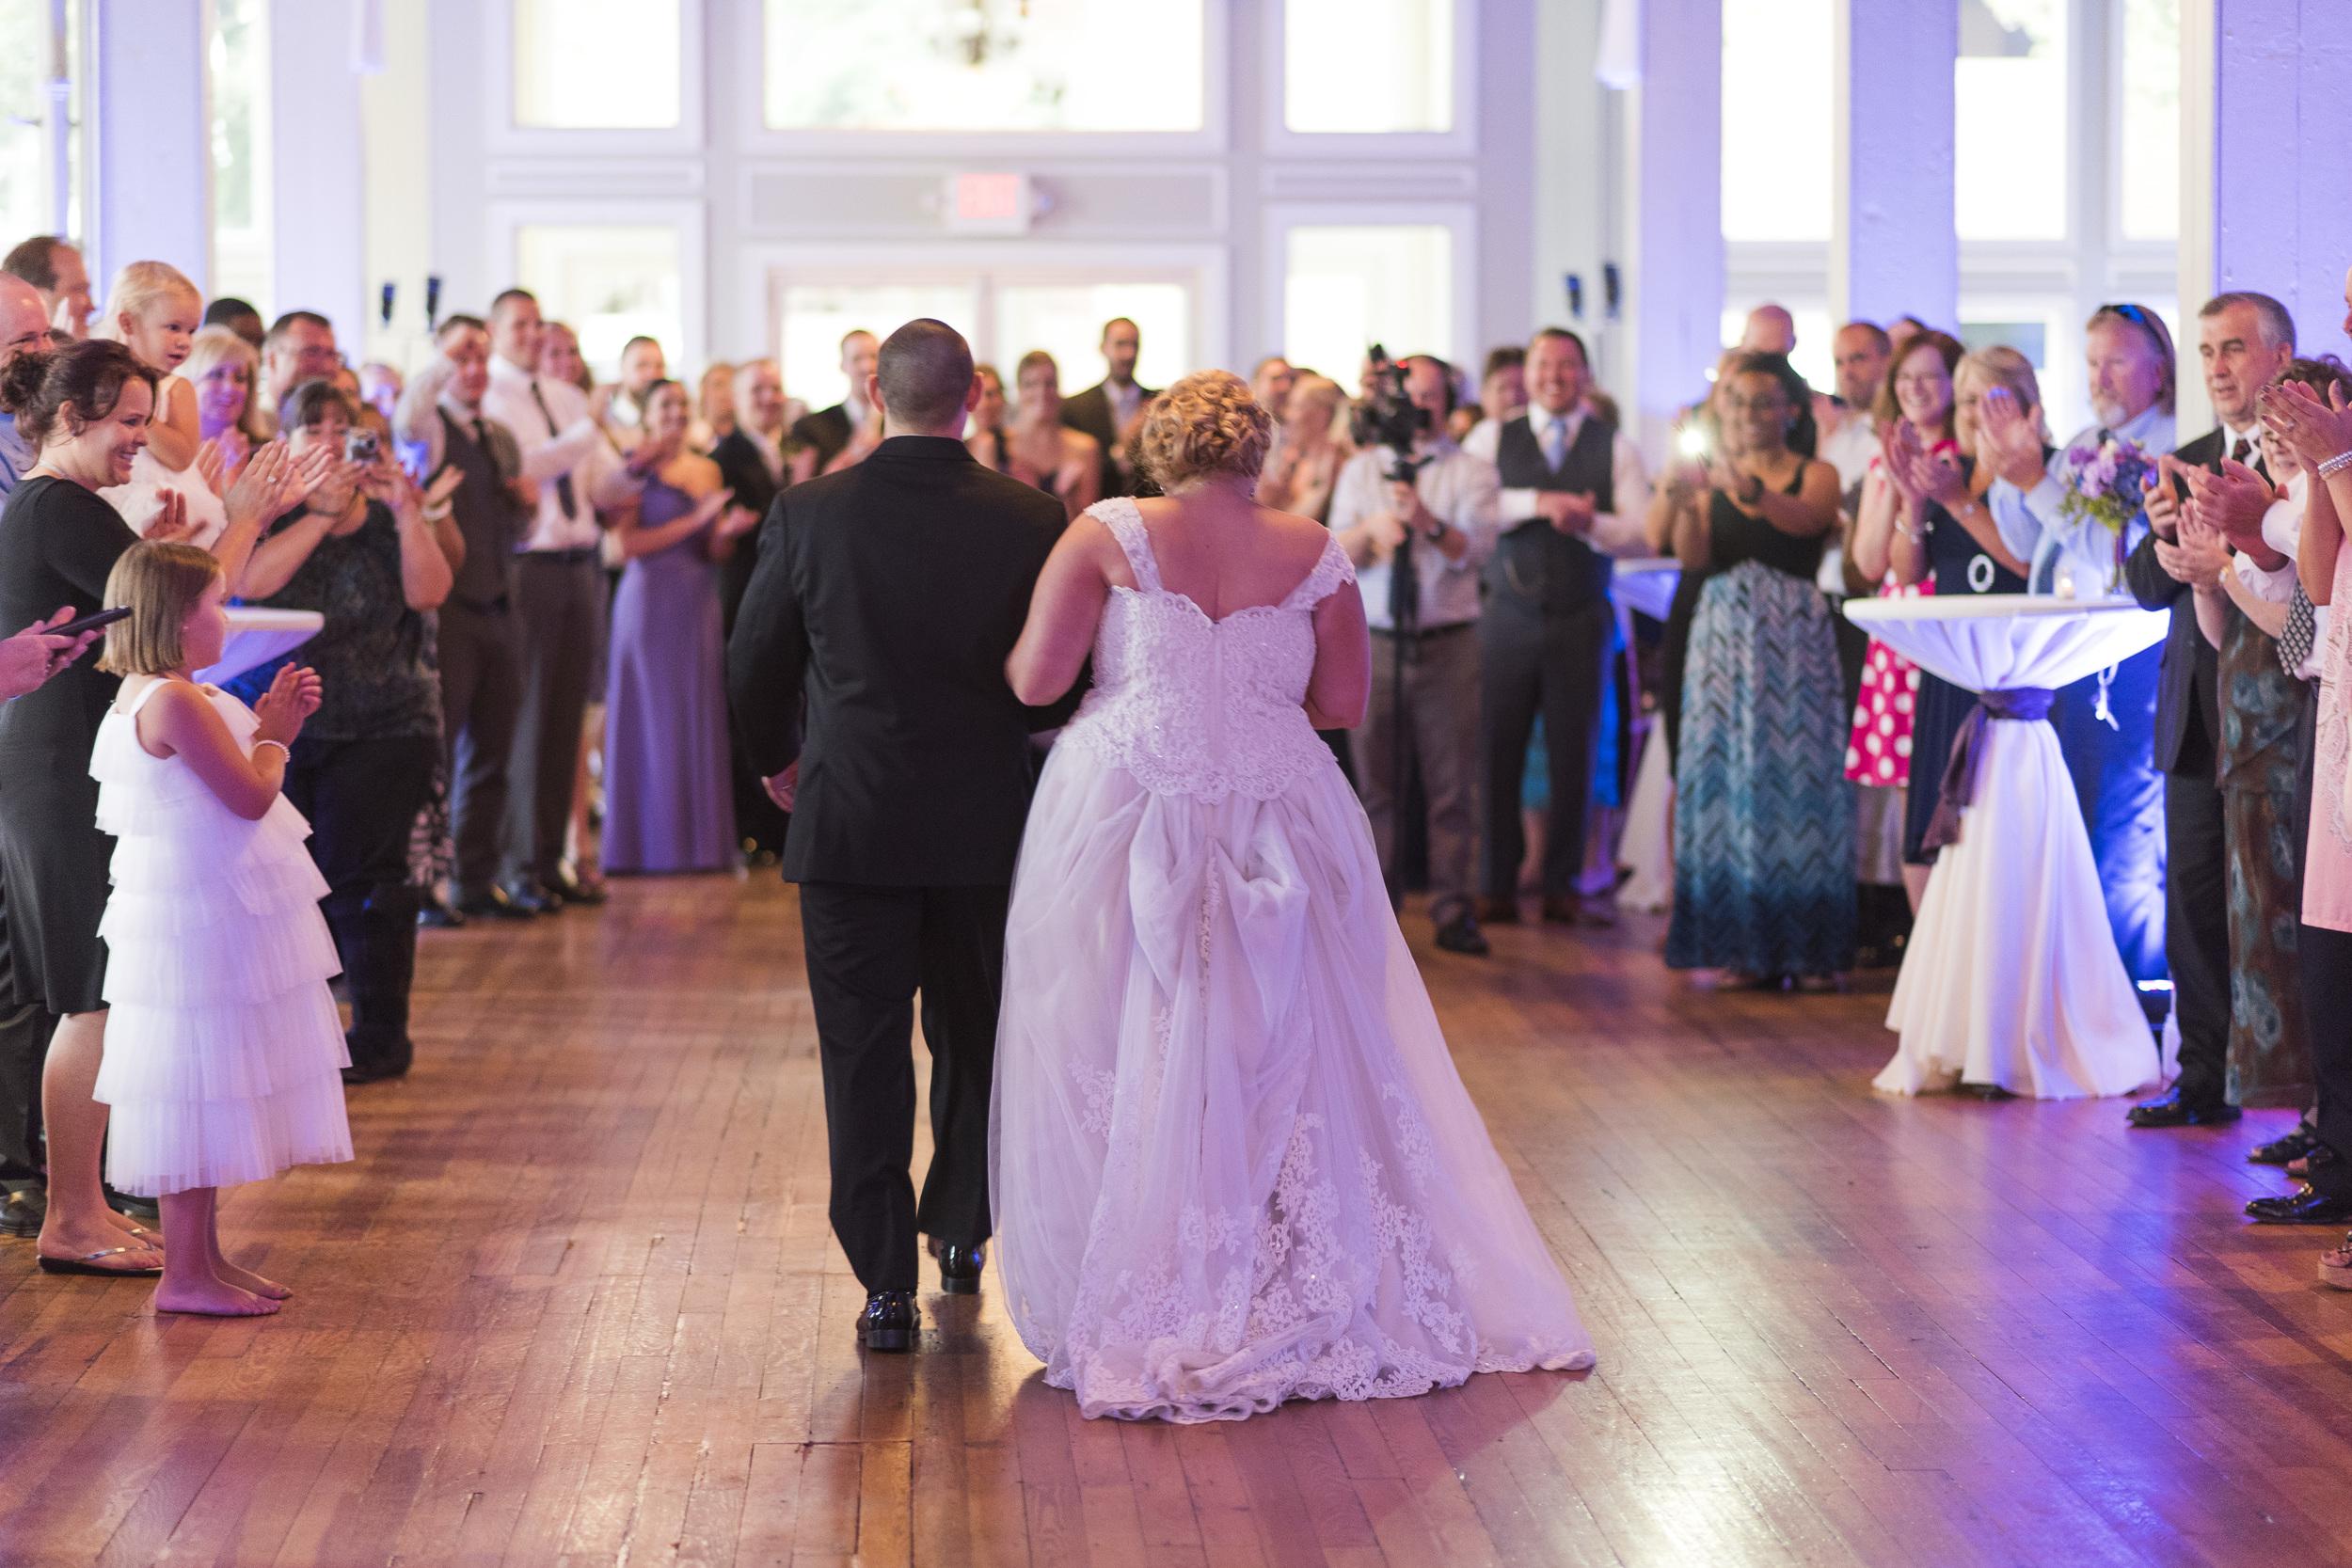 Lynchburg_VA_Wedding_Tresca on 8th_Downtown_Purple_elegant_Photos912.jpg